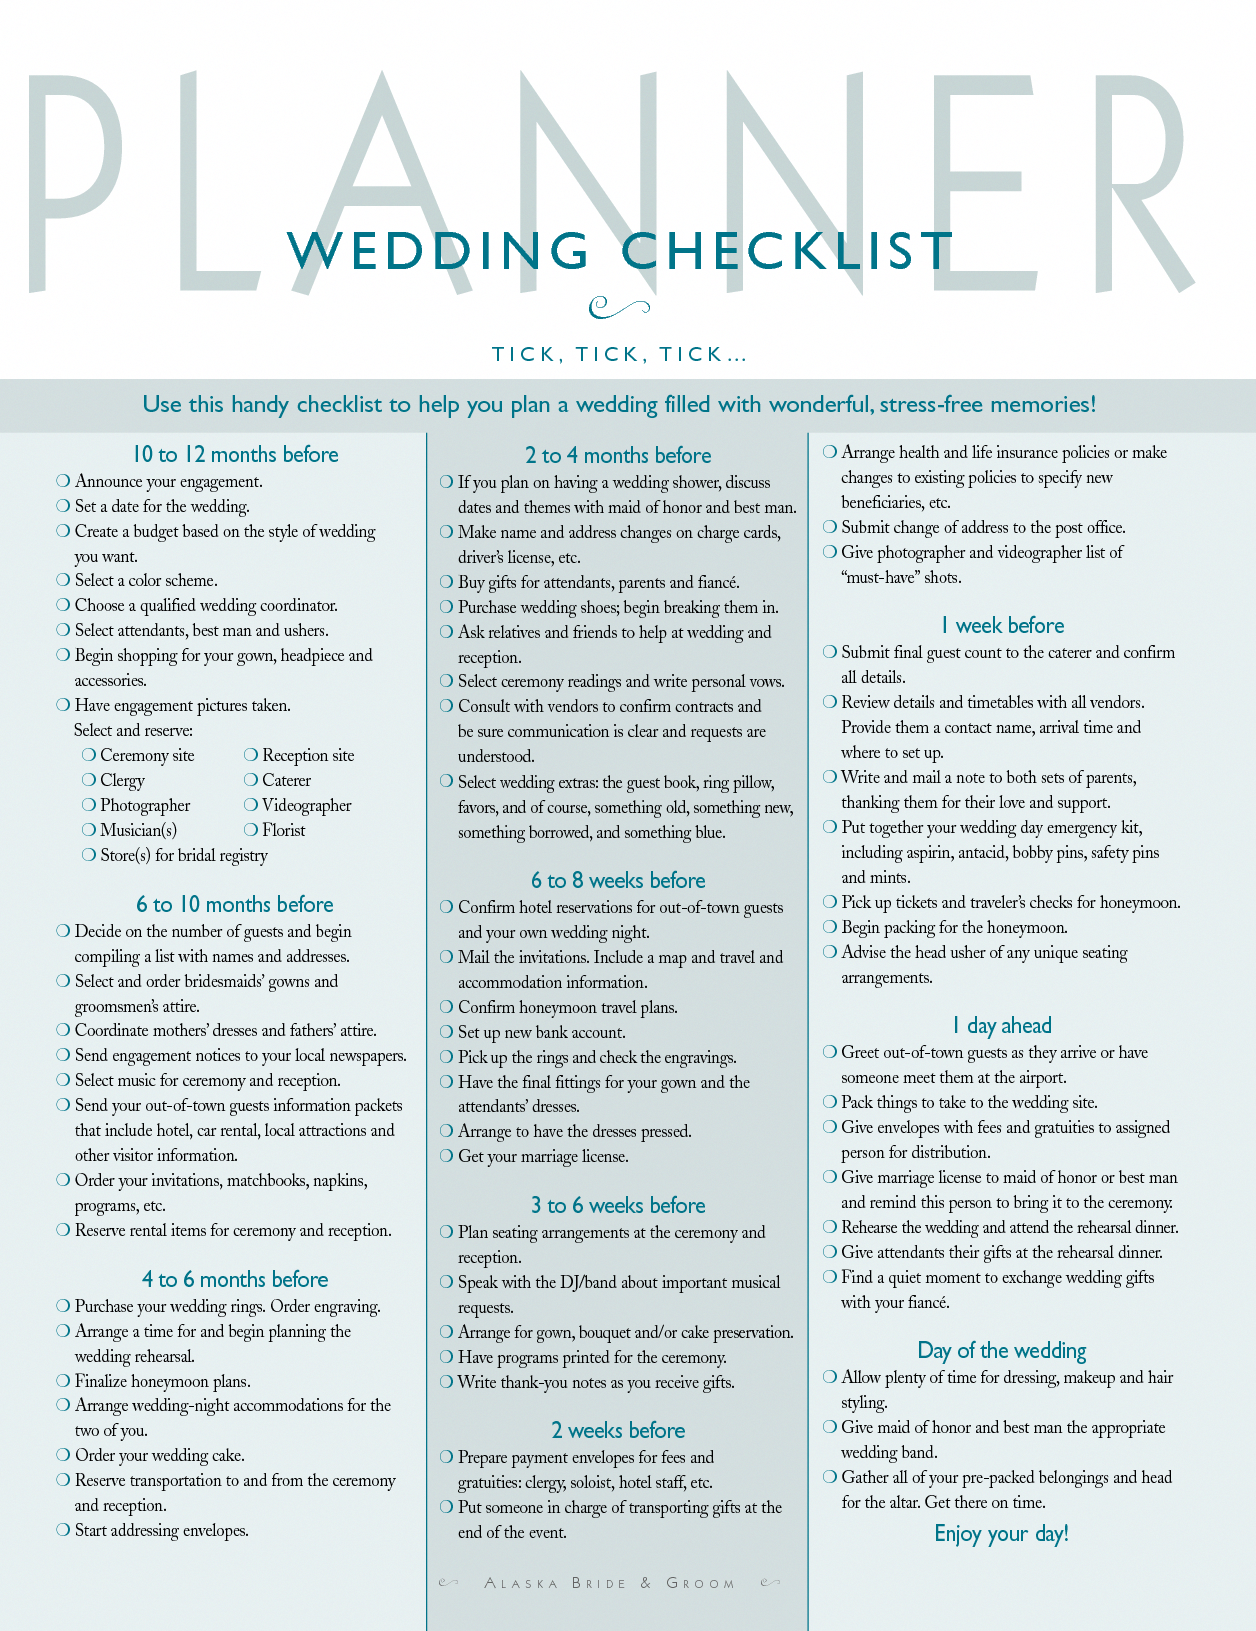 weddingplanningtips wedding in 2018 pinterest wedding